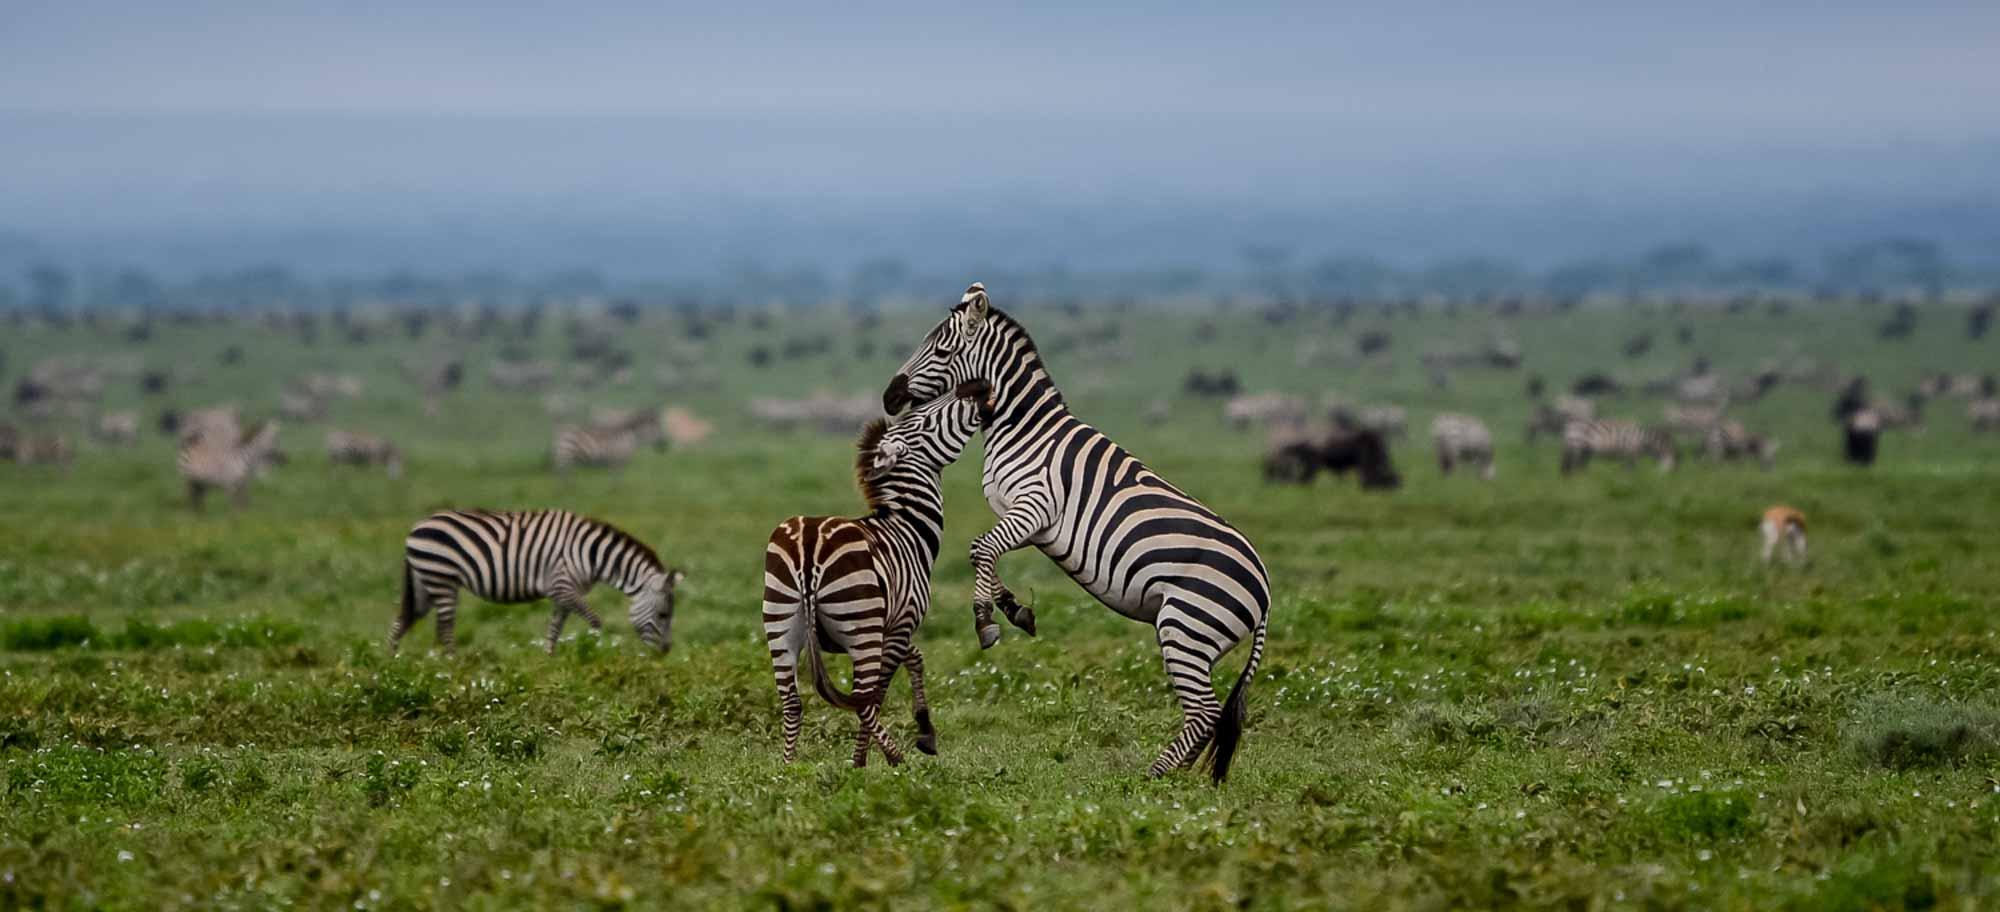 Safari Tanzania Ngorongoro Cebra Agencia de viajes Africaatumedida - 01